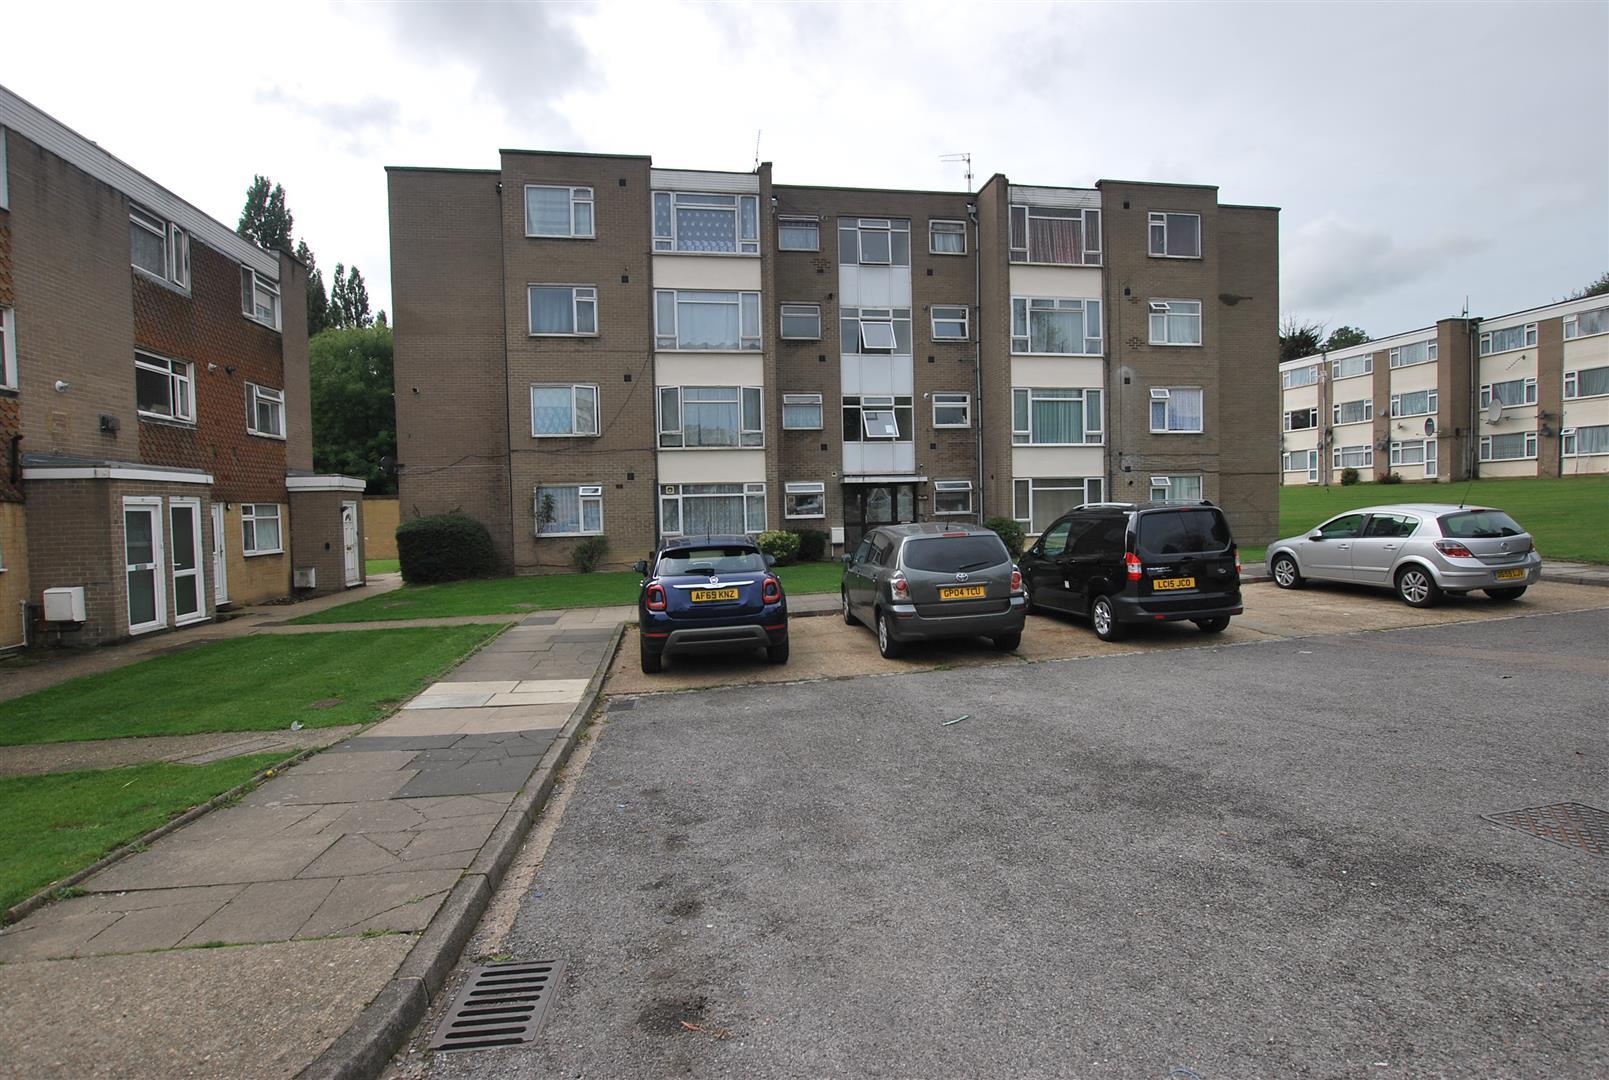 2 bedroom Flat for rent in Wembley